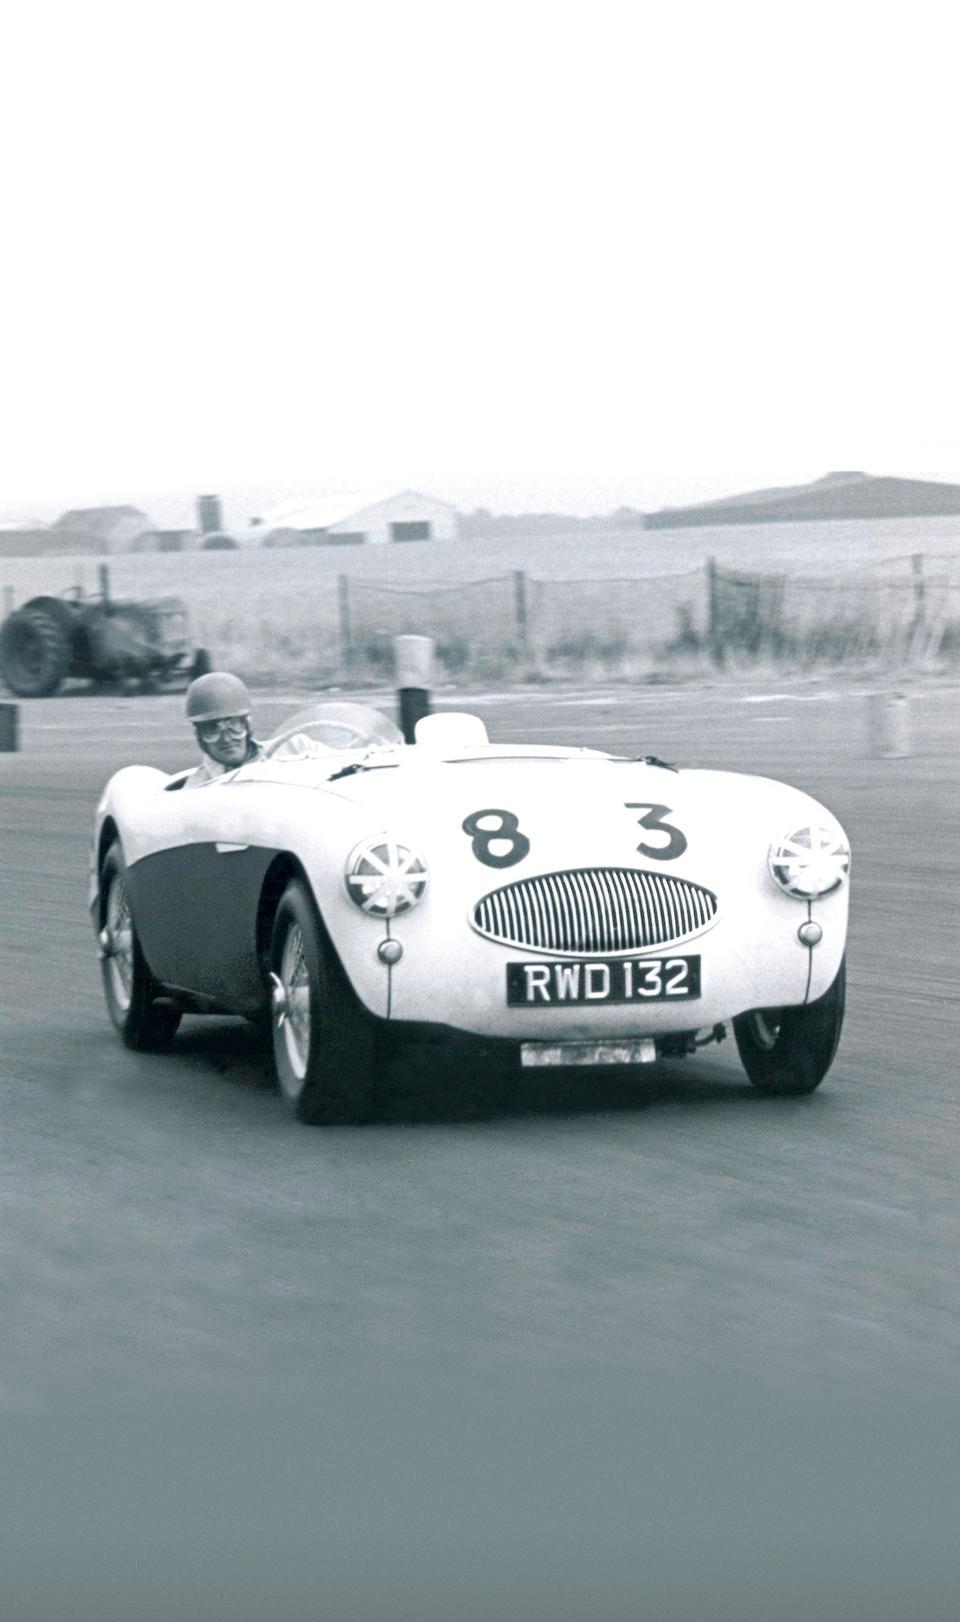 'RWD 132' - The ex-John Dalton, Arthur Carter,1955 Austin-Healey 100S Sports-Racing Two-Seater  Chassis no. AHS 3702